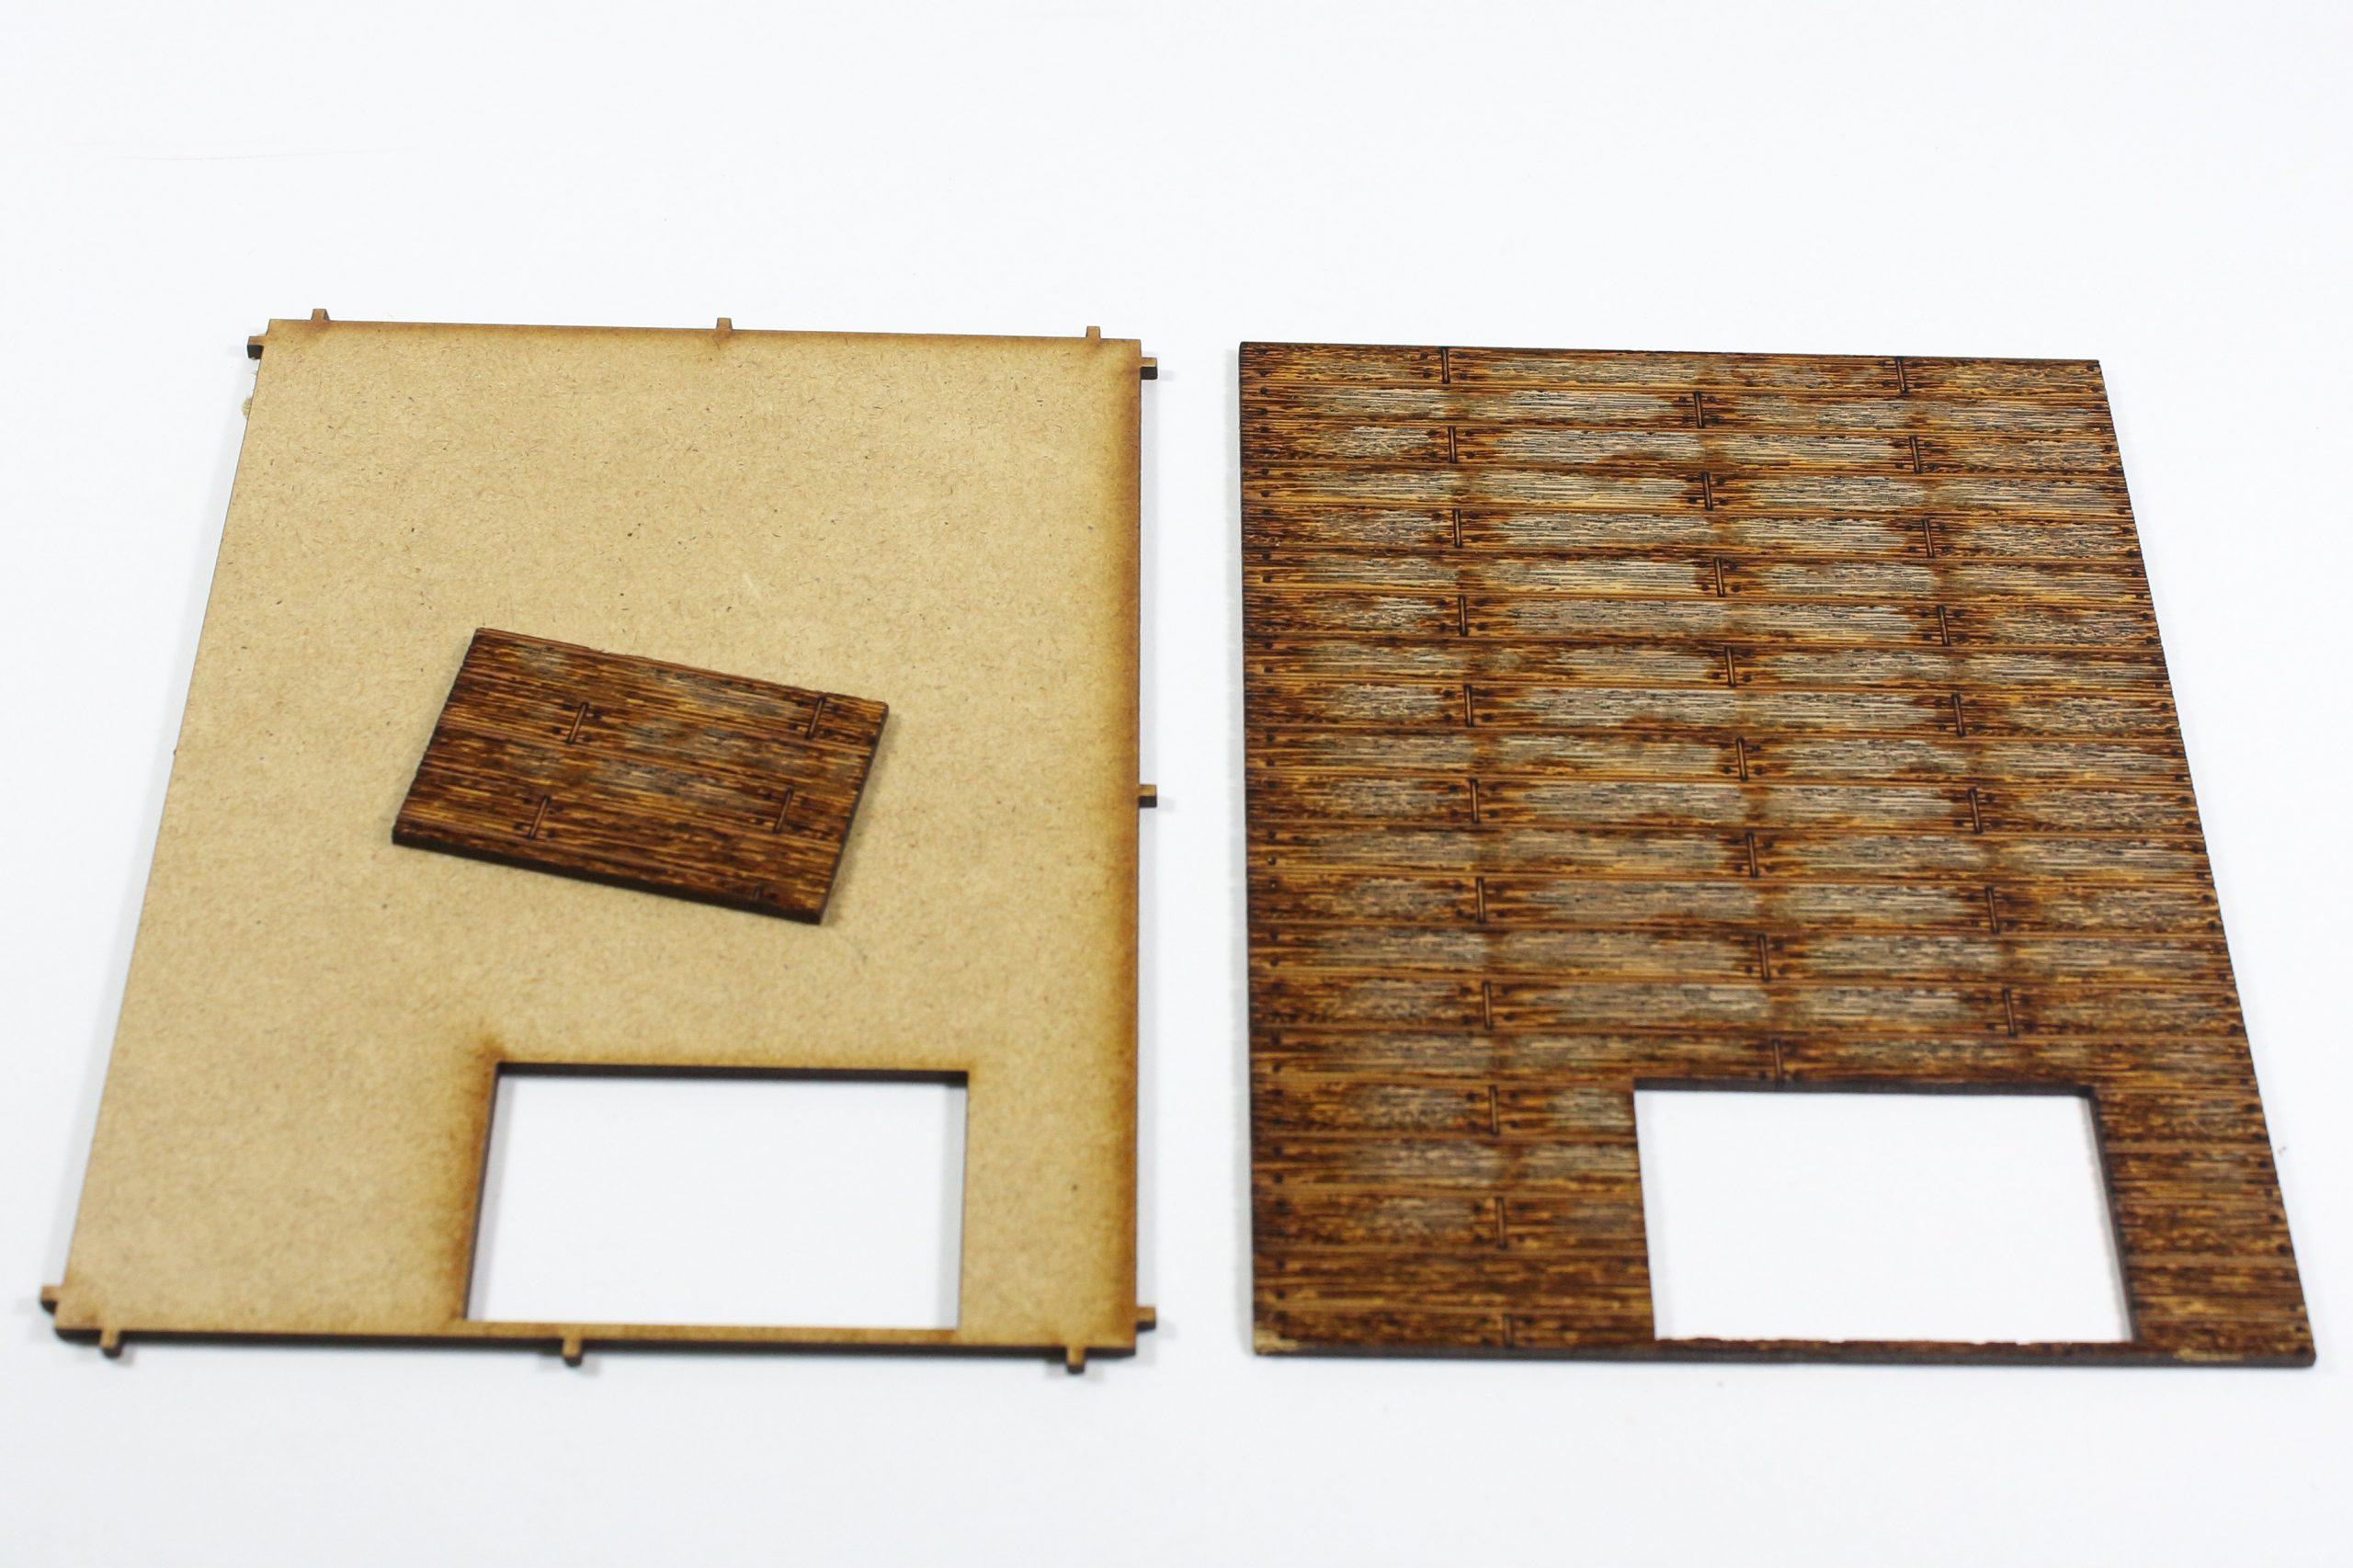 Bild-4-scaled Fachwerkhaus mit Holzschuppen - Lasercut Modellbaushop 1:35